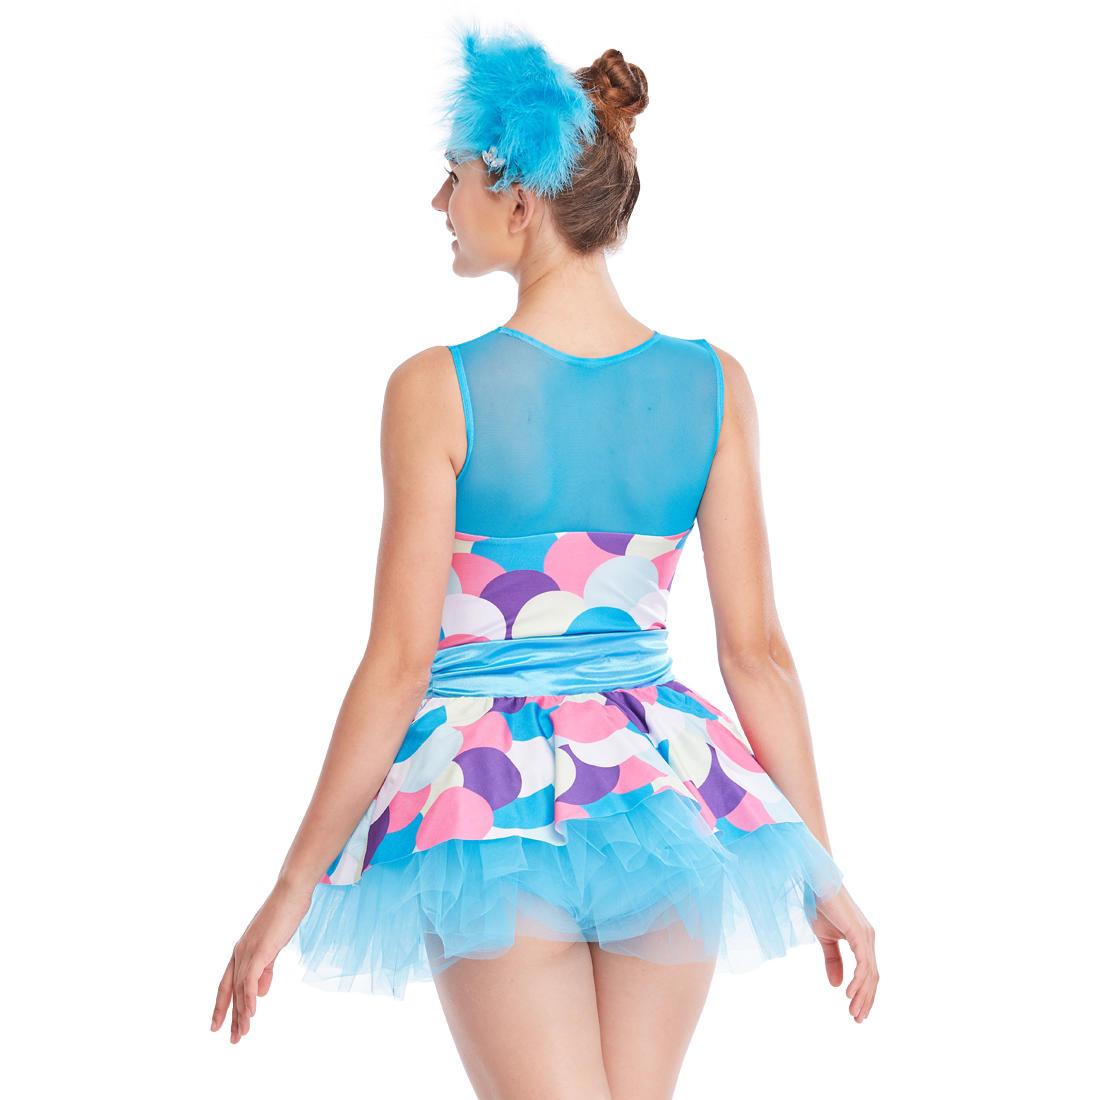 MiDee Children Jazz Dress Dance Costume